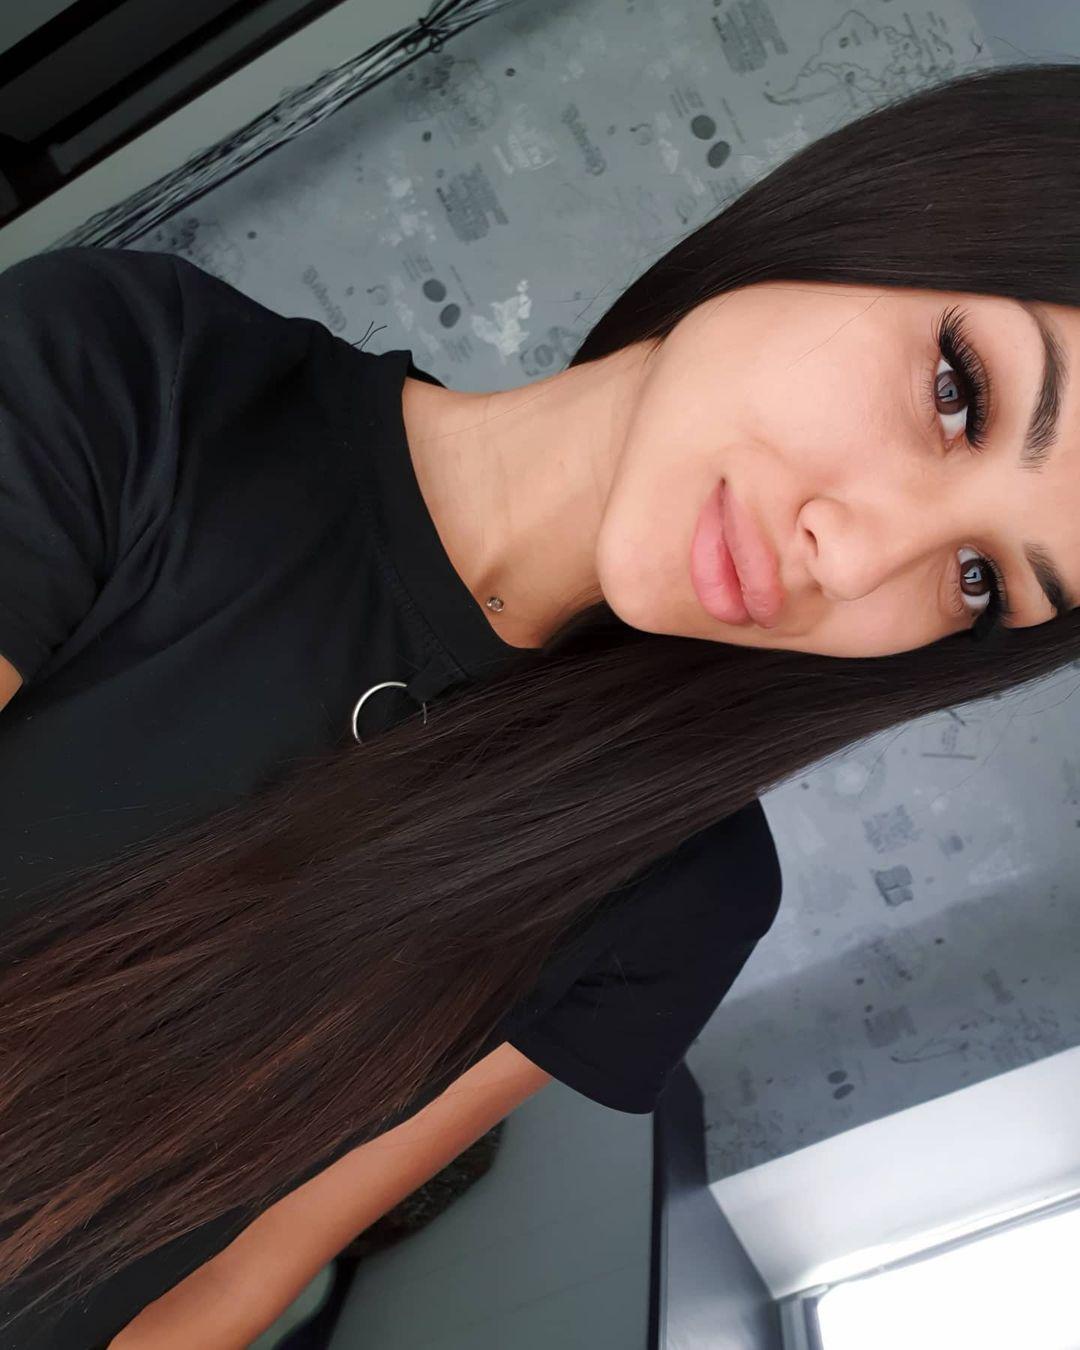 Fatima-Nezhdanova-Wallpapers-Insta-Fit-Bio-9